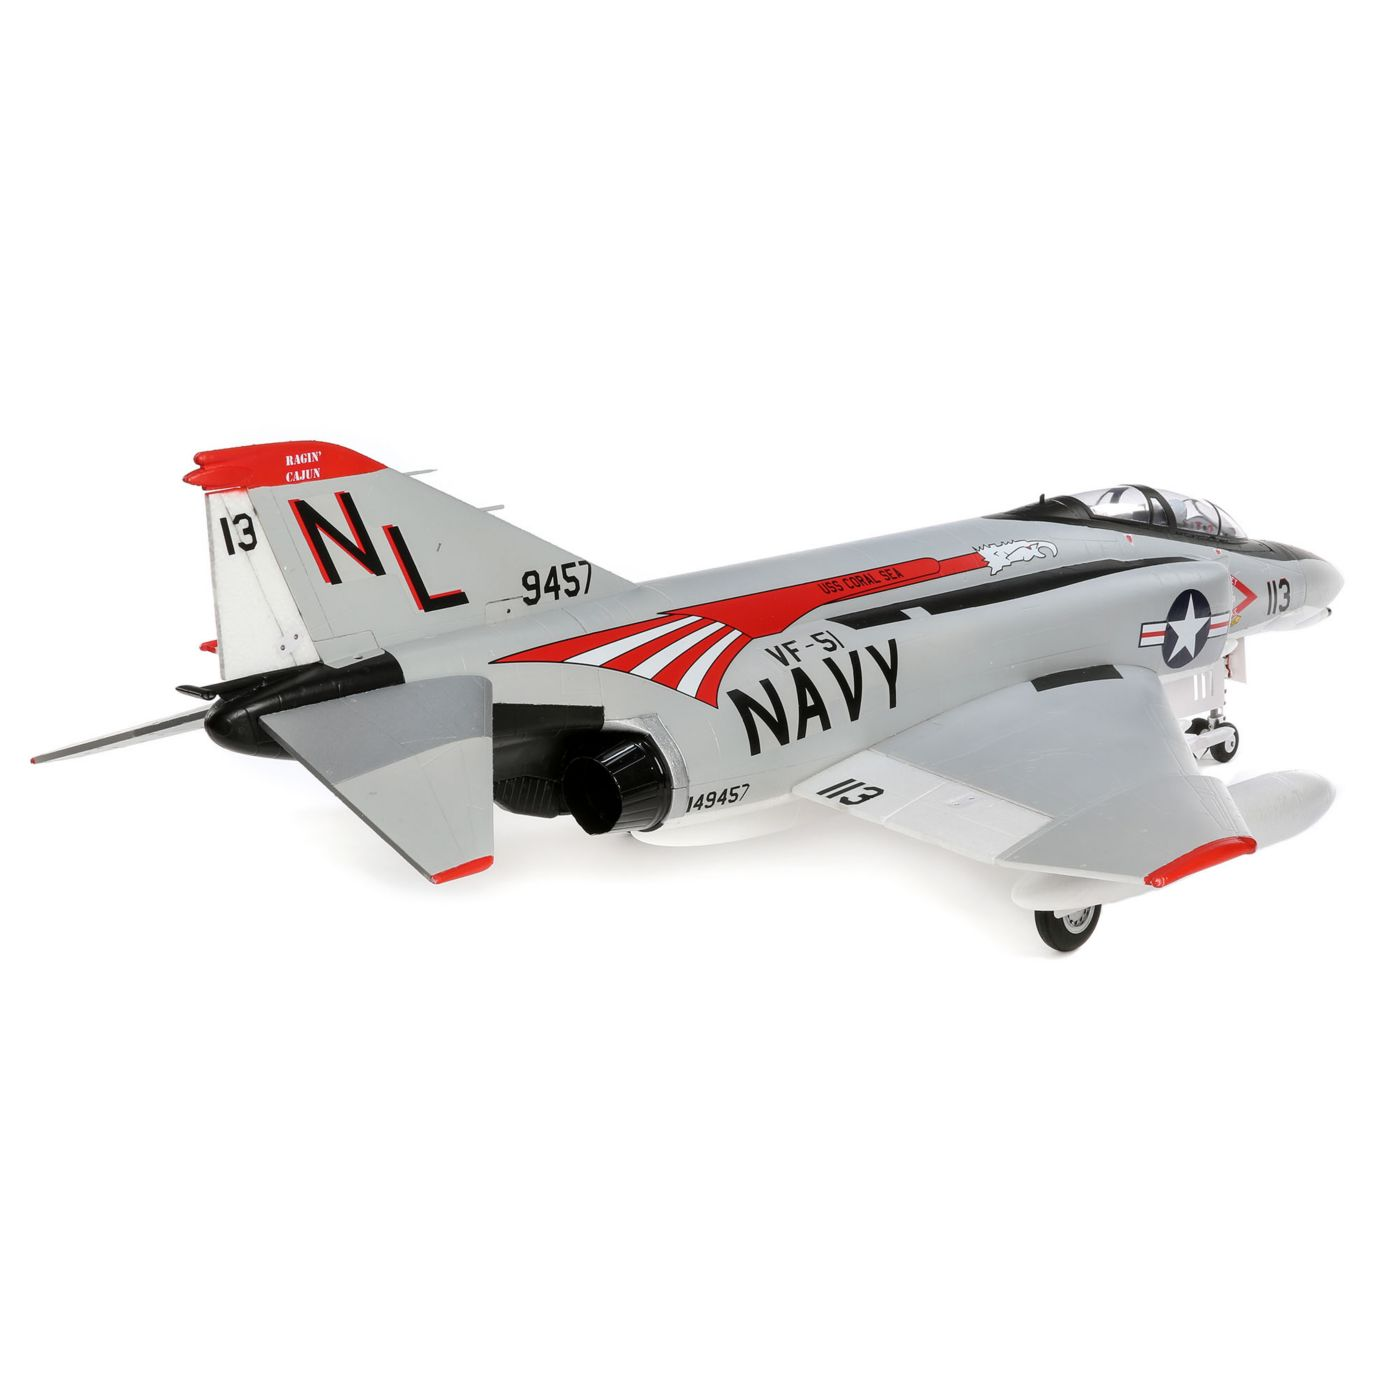 F-4 Phantom II E-flite